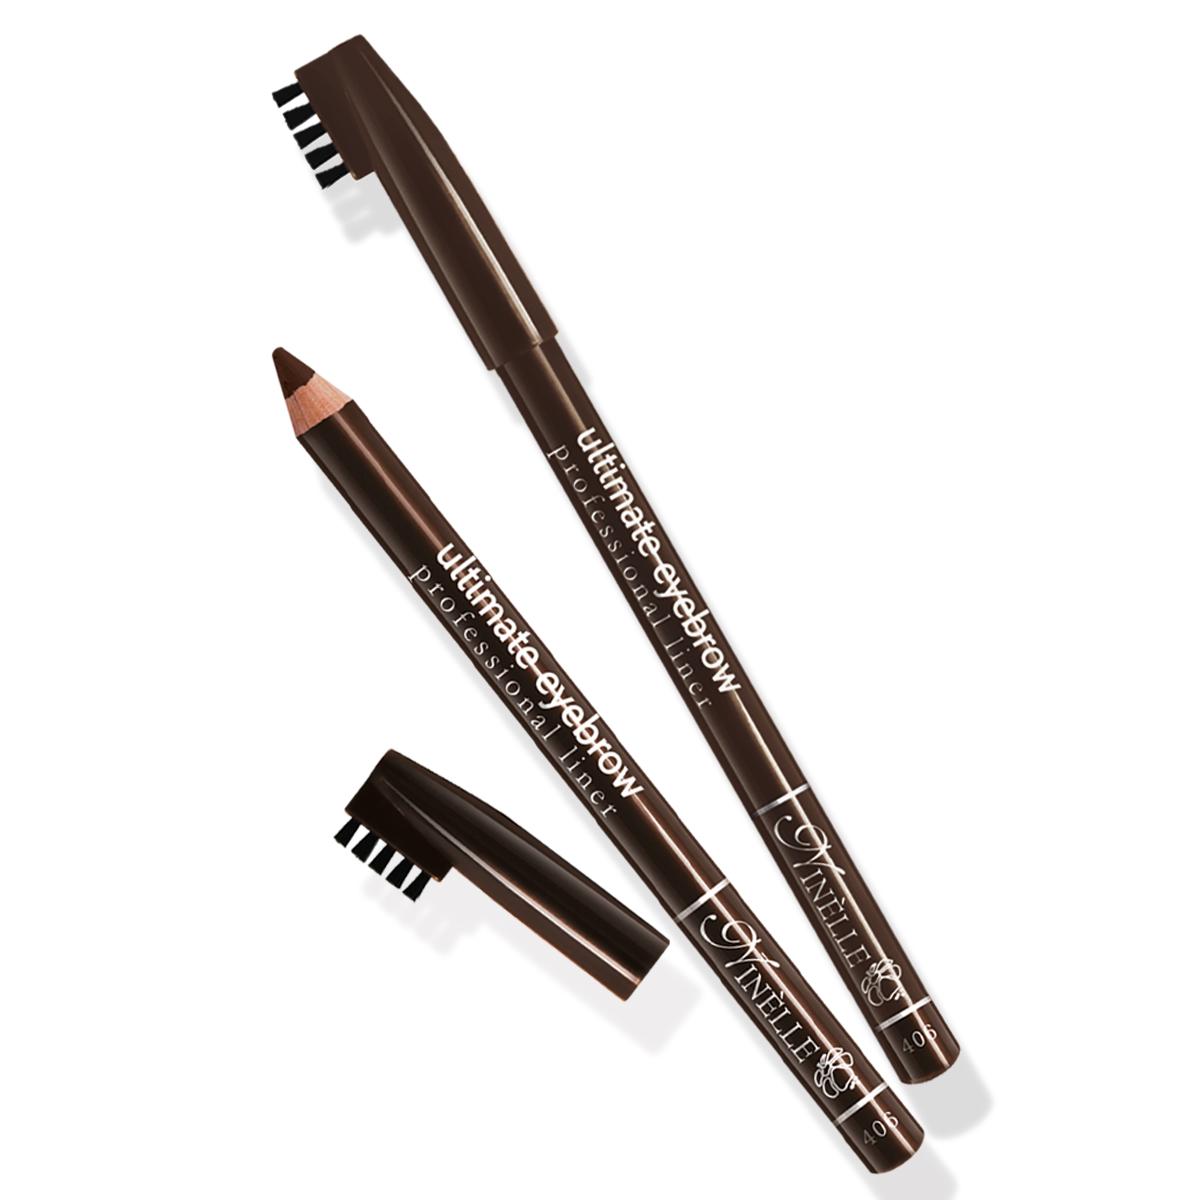 Ninelle Карандаш для бровей Ultimate №406, 1,5 г косметические карандаши ninelle карандаш для бровей ultimate 406